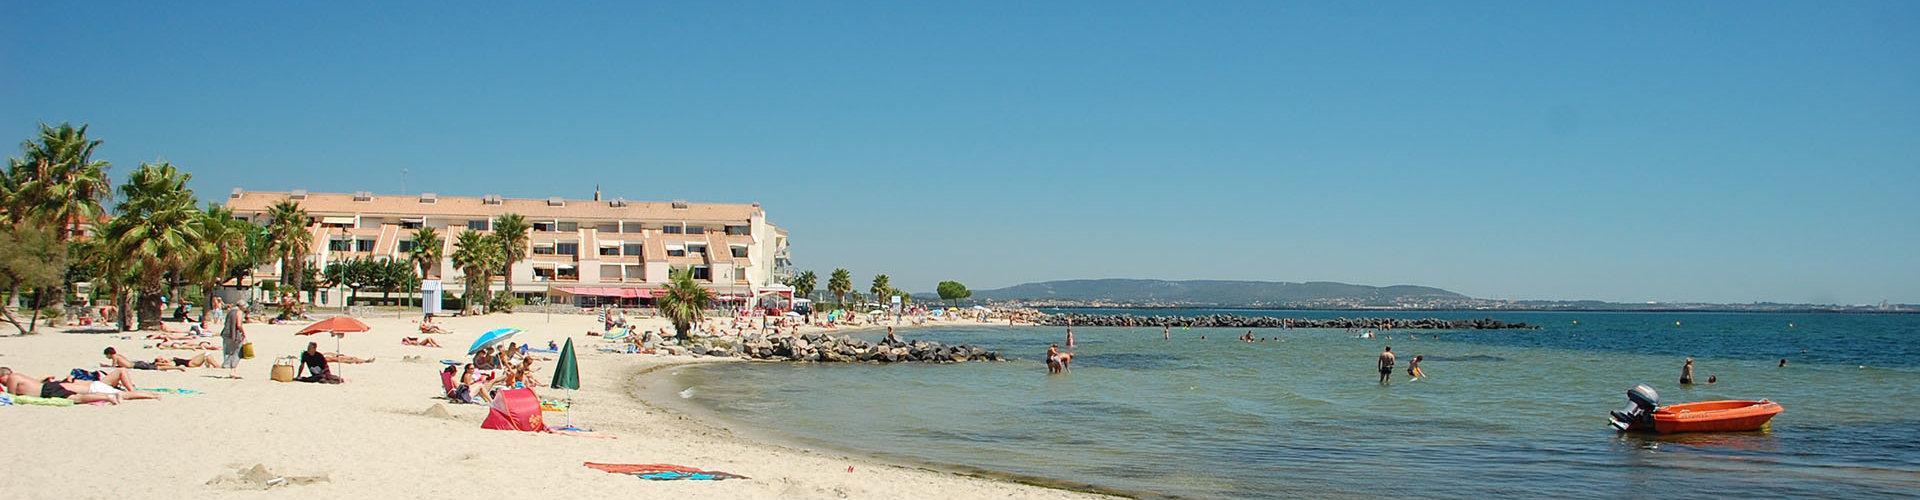 Strand in de Camargue